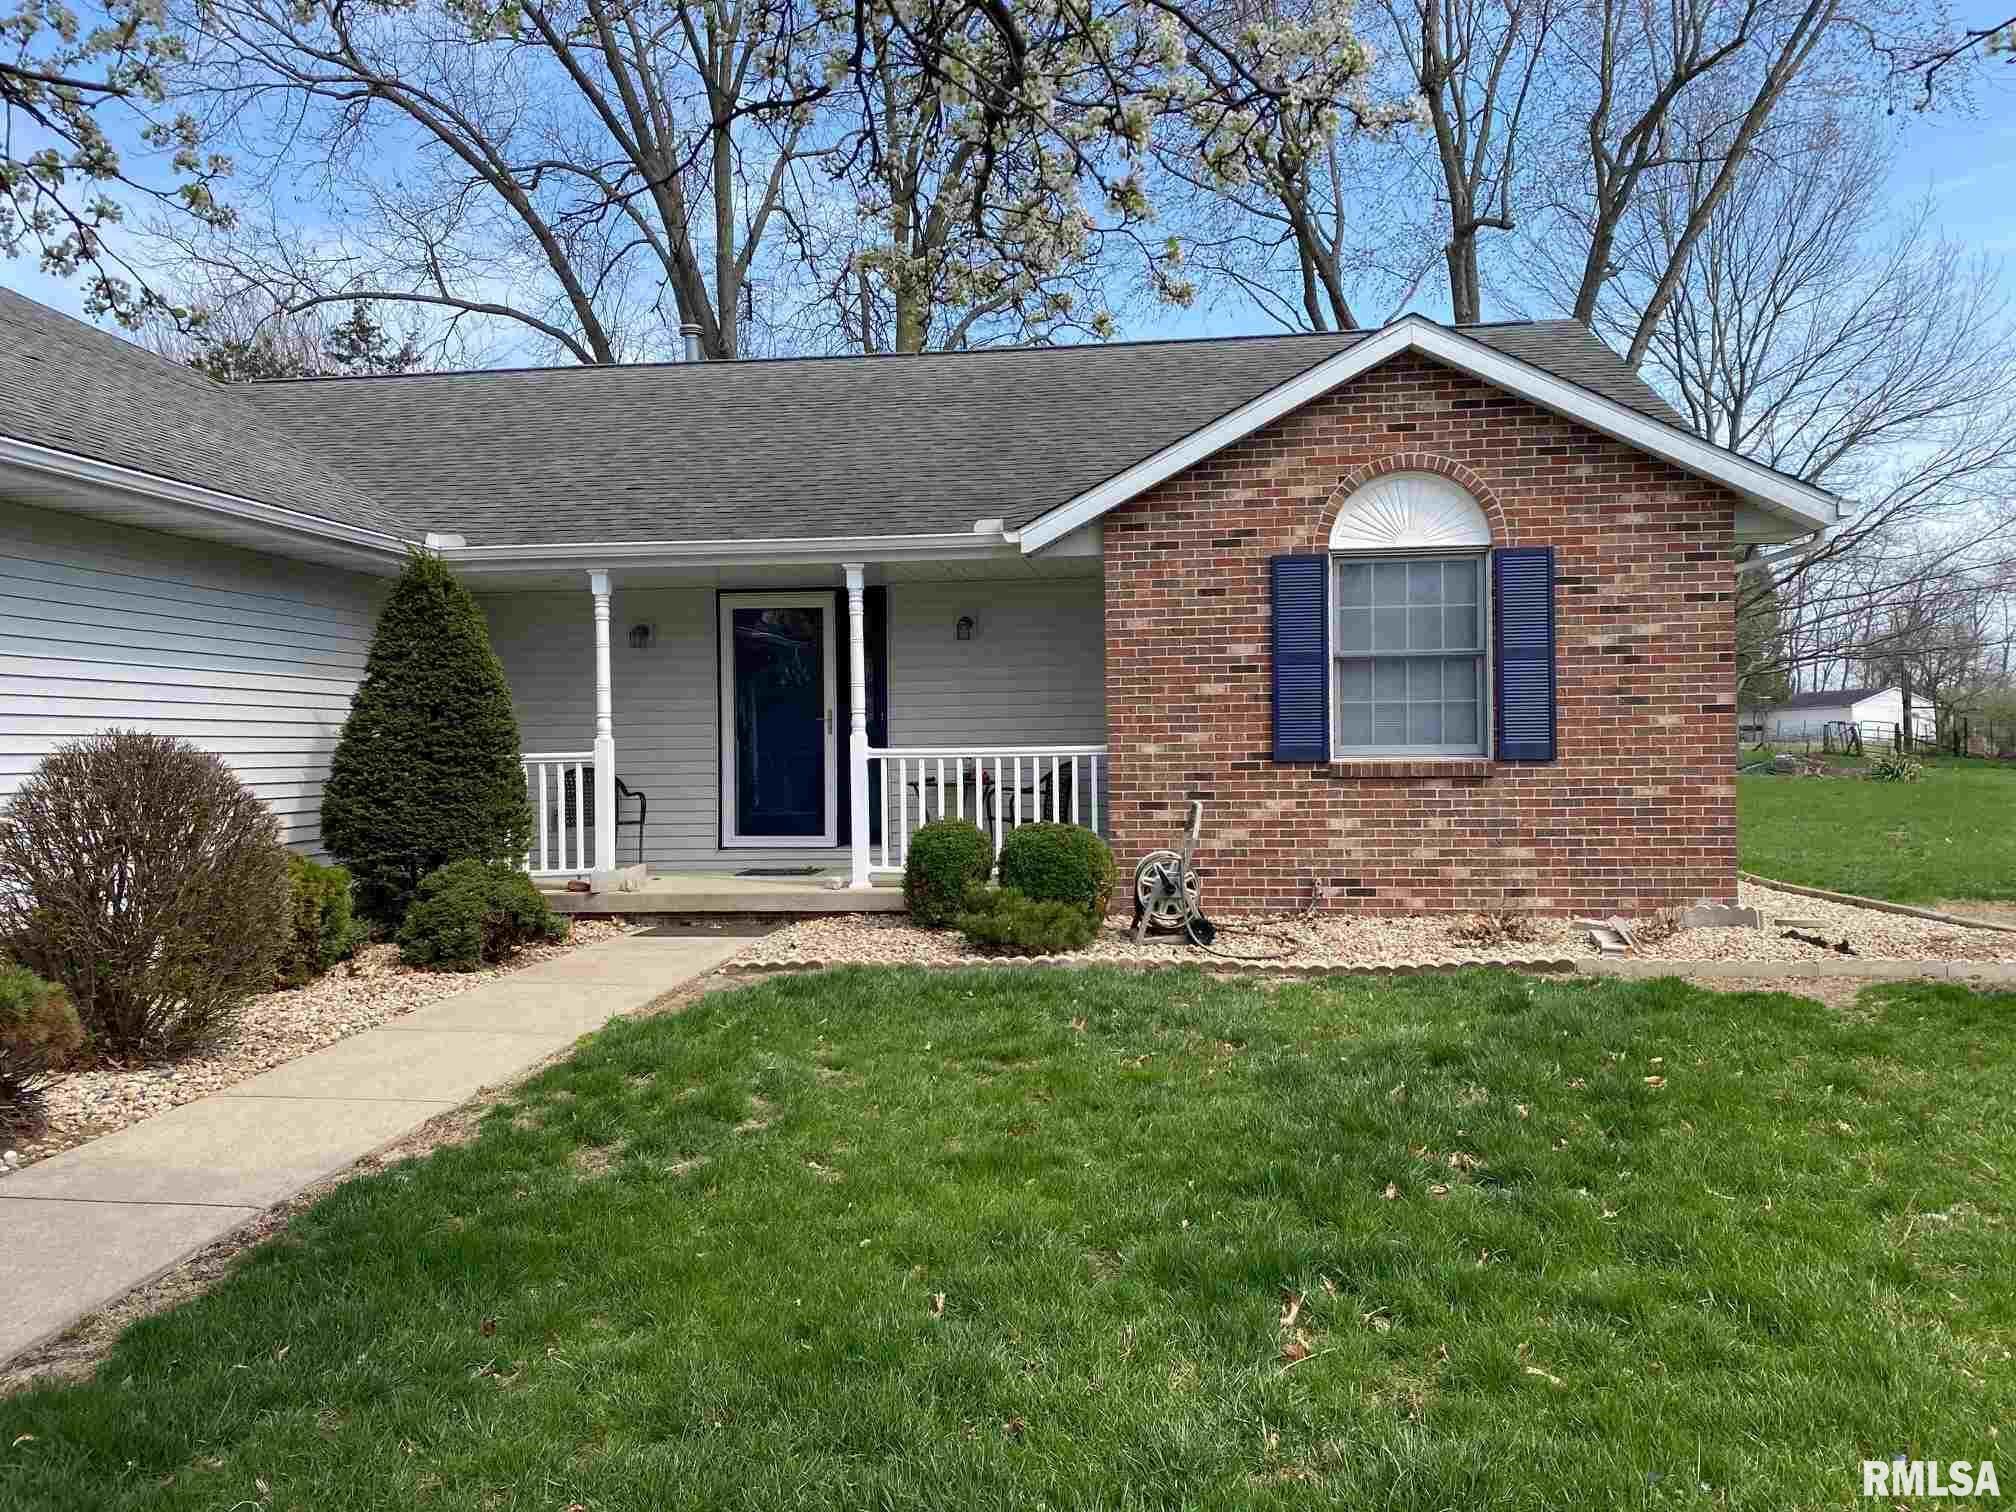 118 S 5TH Property Photo - Riverton, IL real estate listing